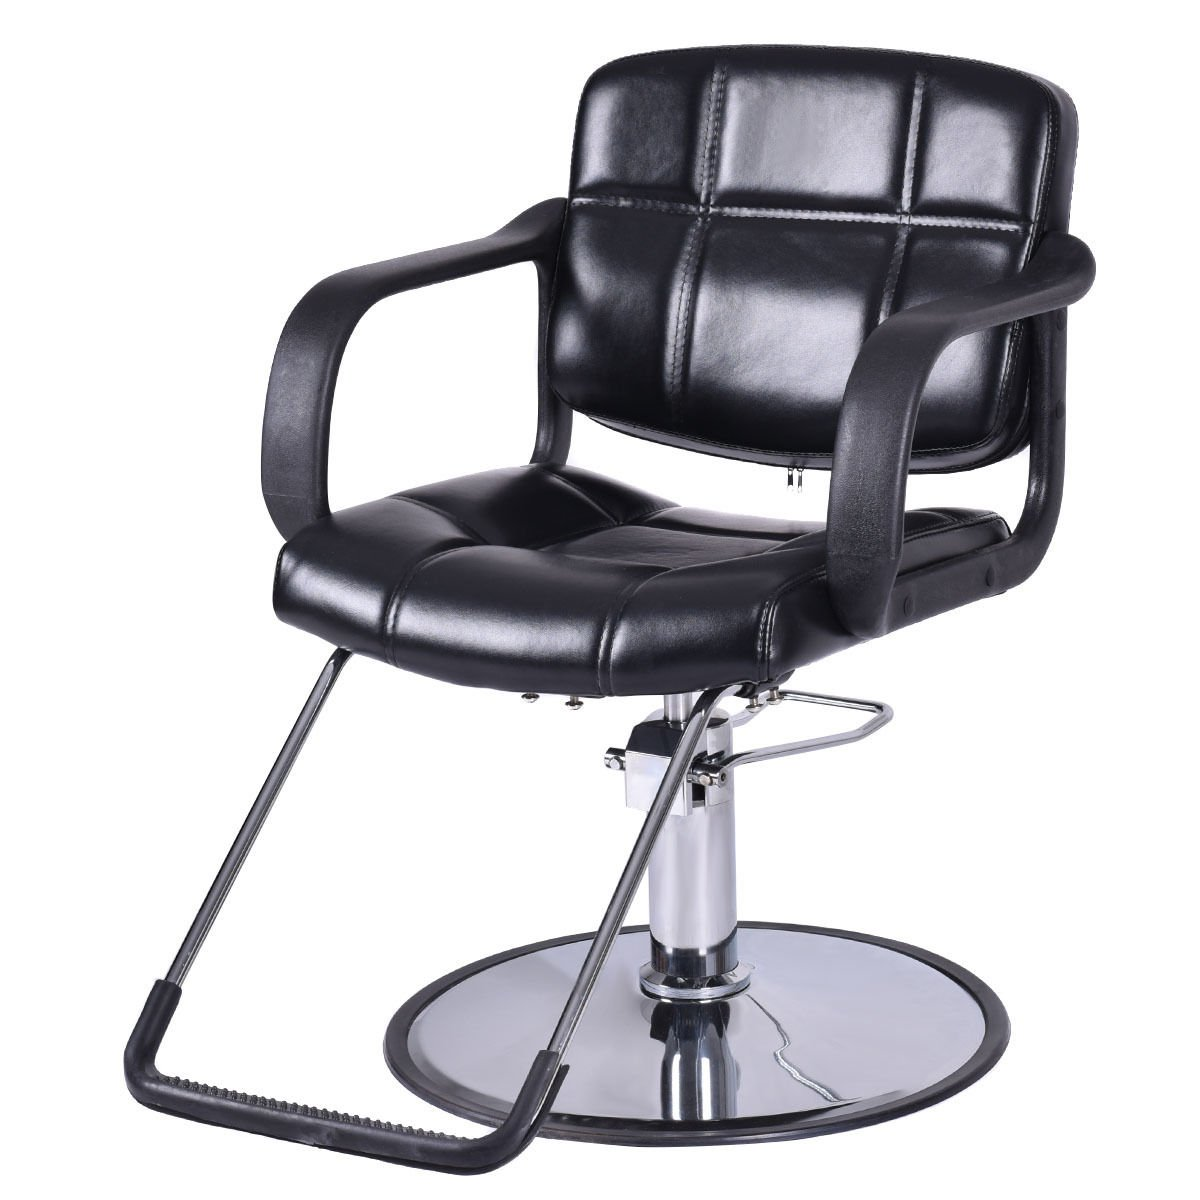 "Giantex Classic Hydraulic Barber Chair Salon Beauty Spa Shampoo Hair Styling Equipment, 25"" Wide (Hydraulic Barber Chair) HB84538"